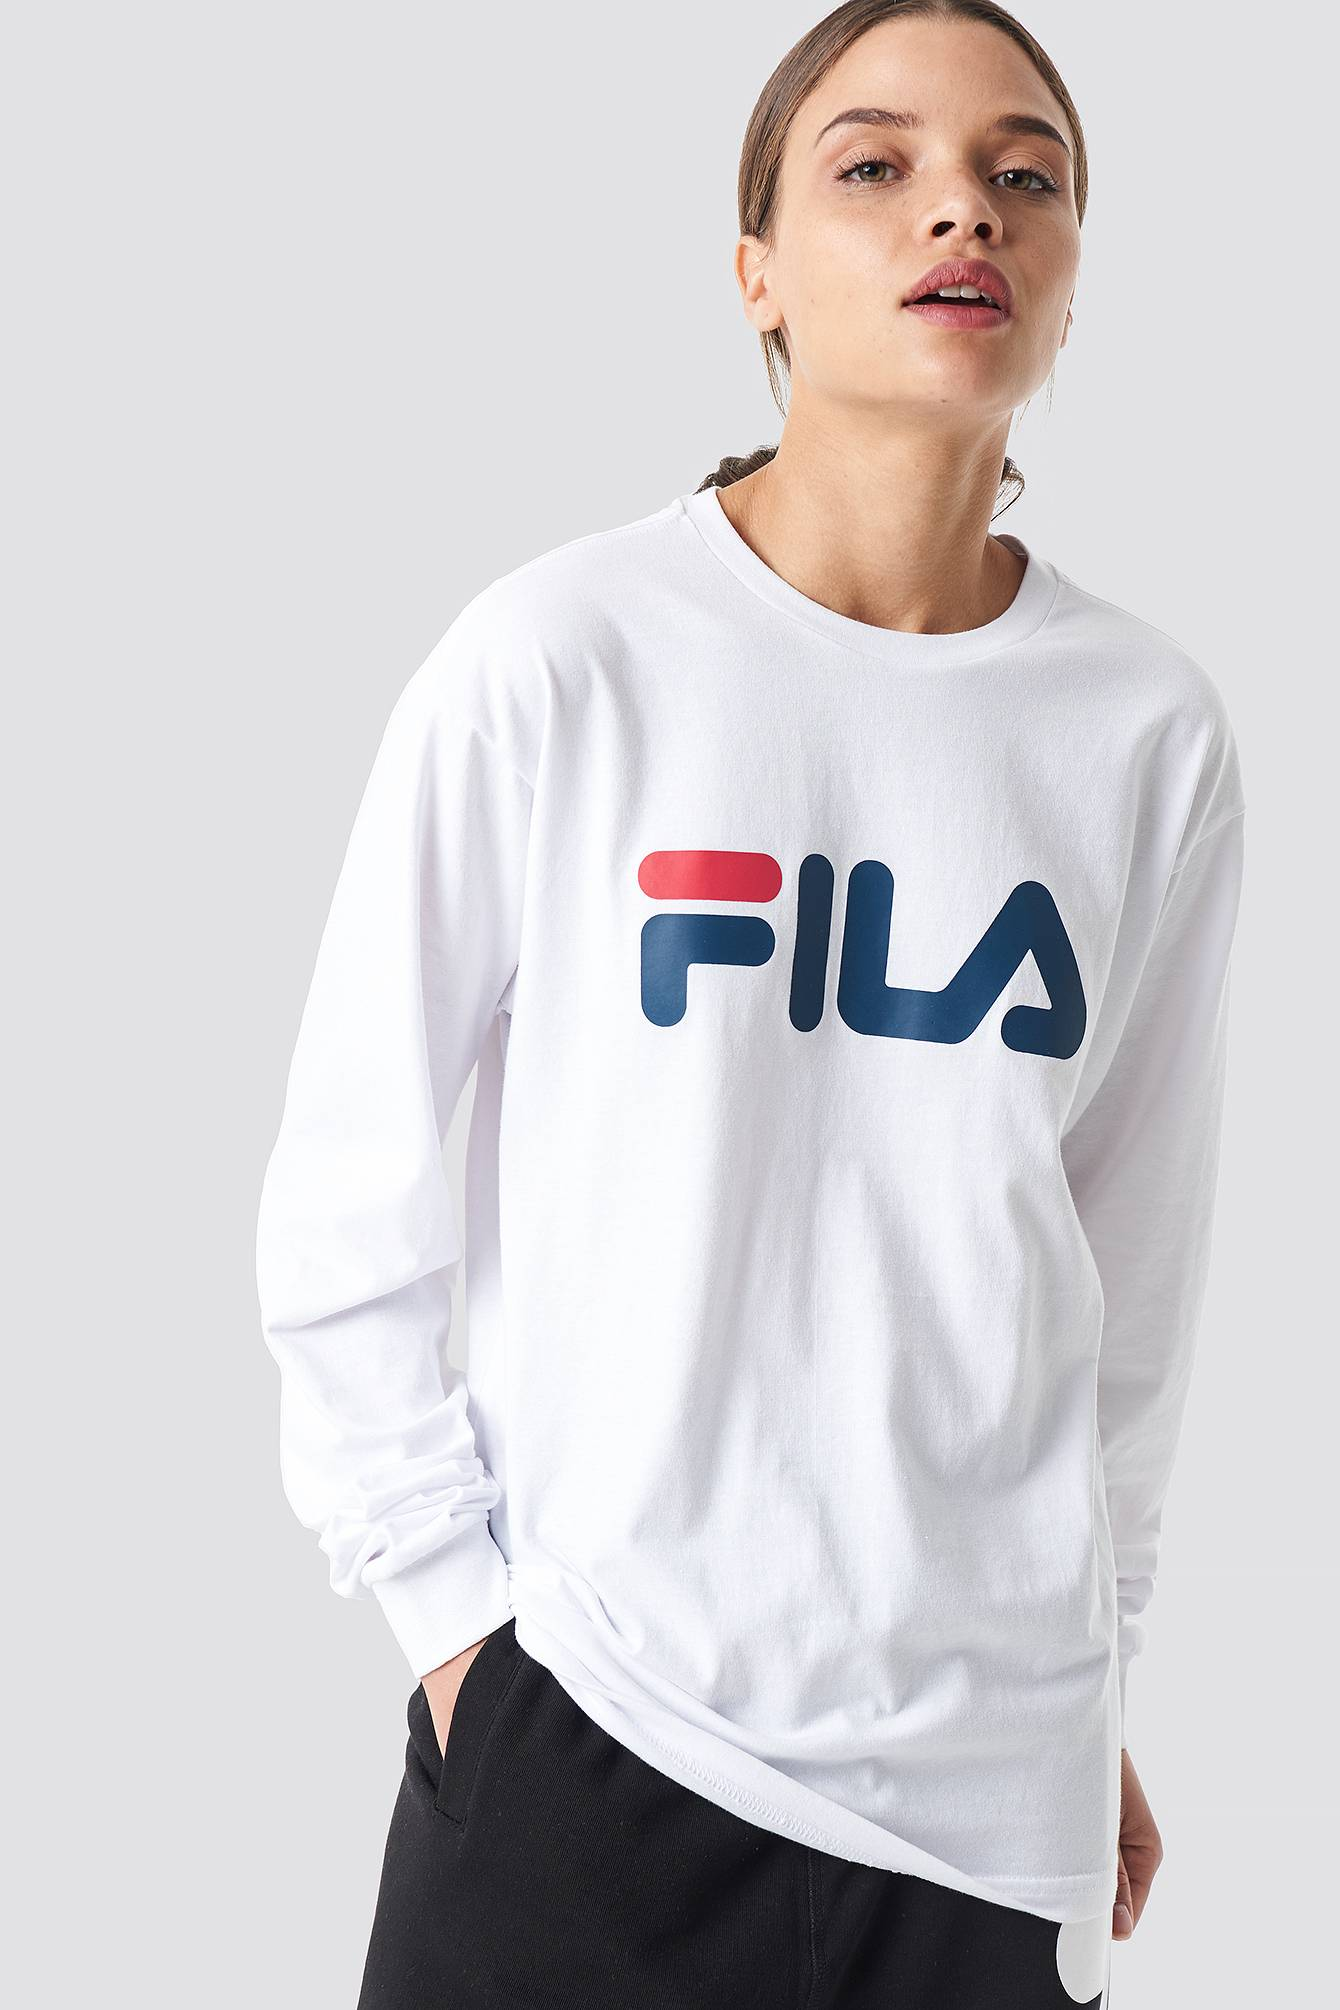 FILA Classic Pure Long Sleeve Shirt - White  - Size: Small